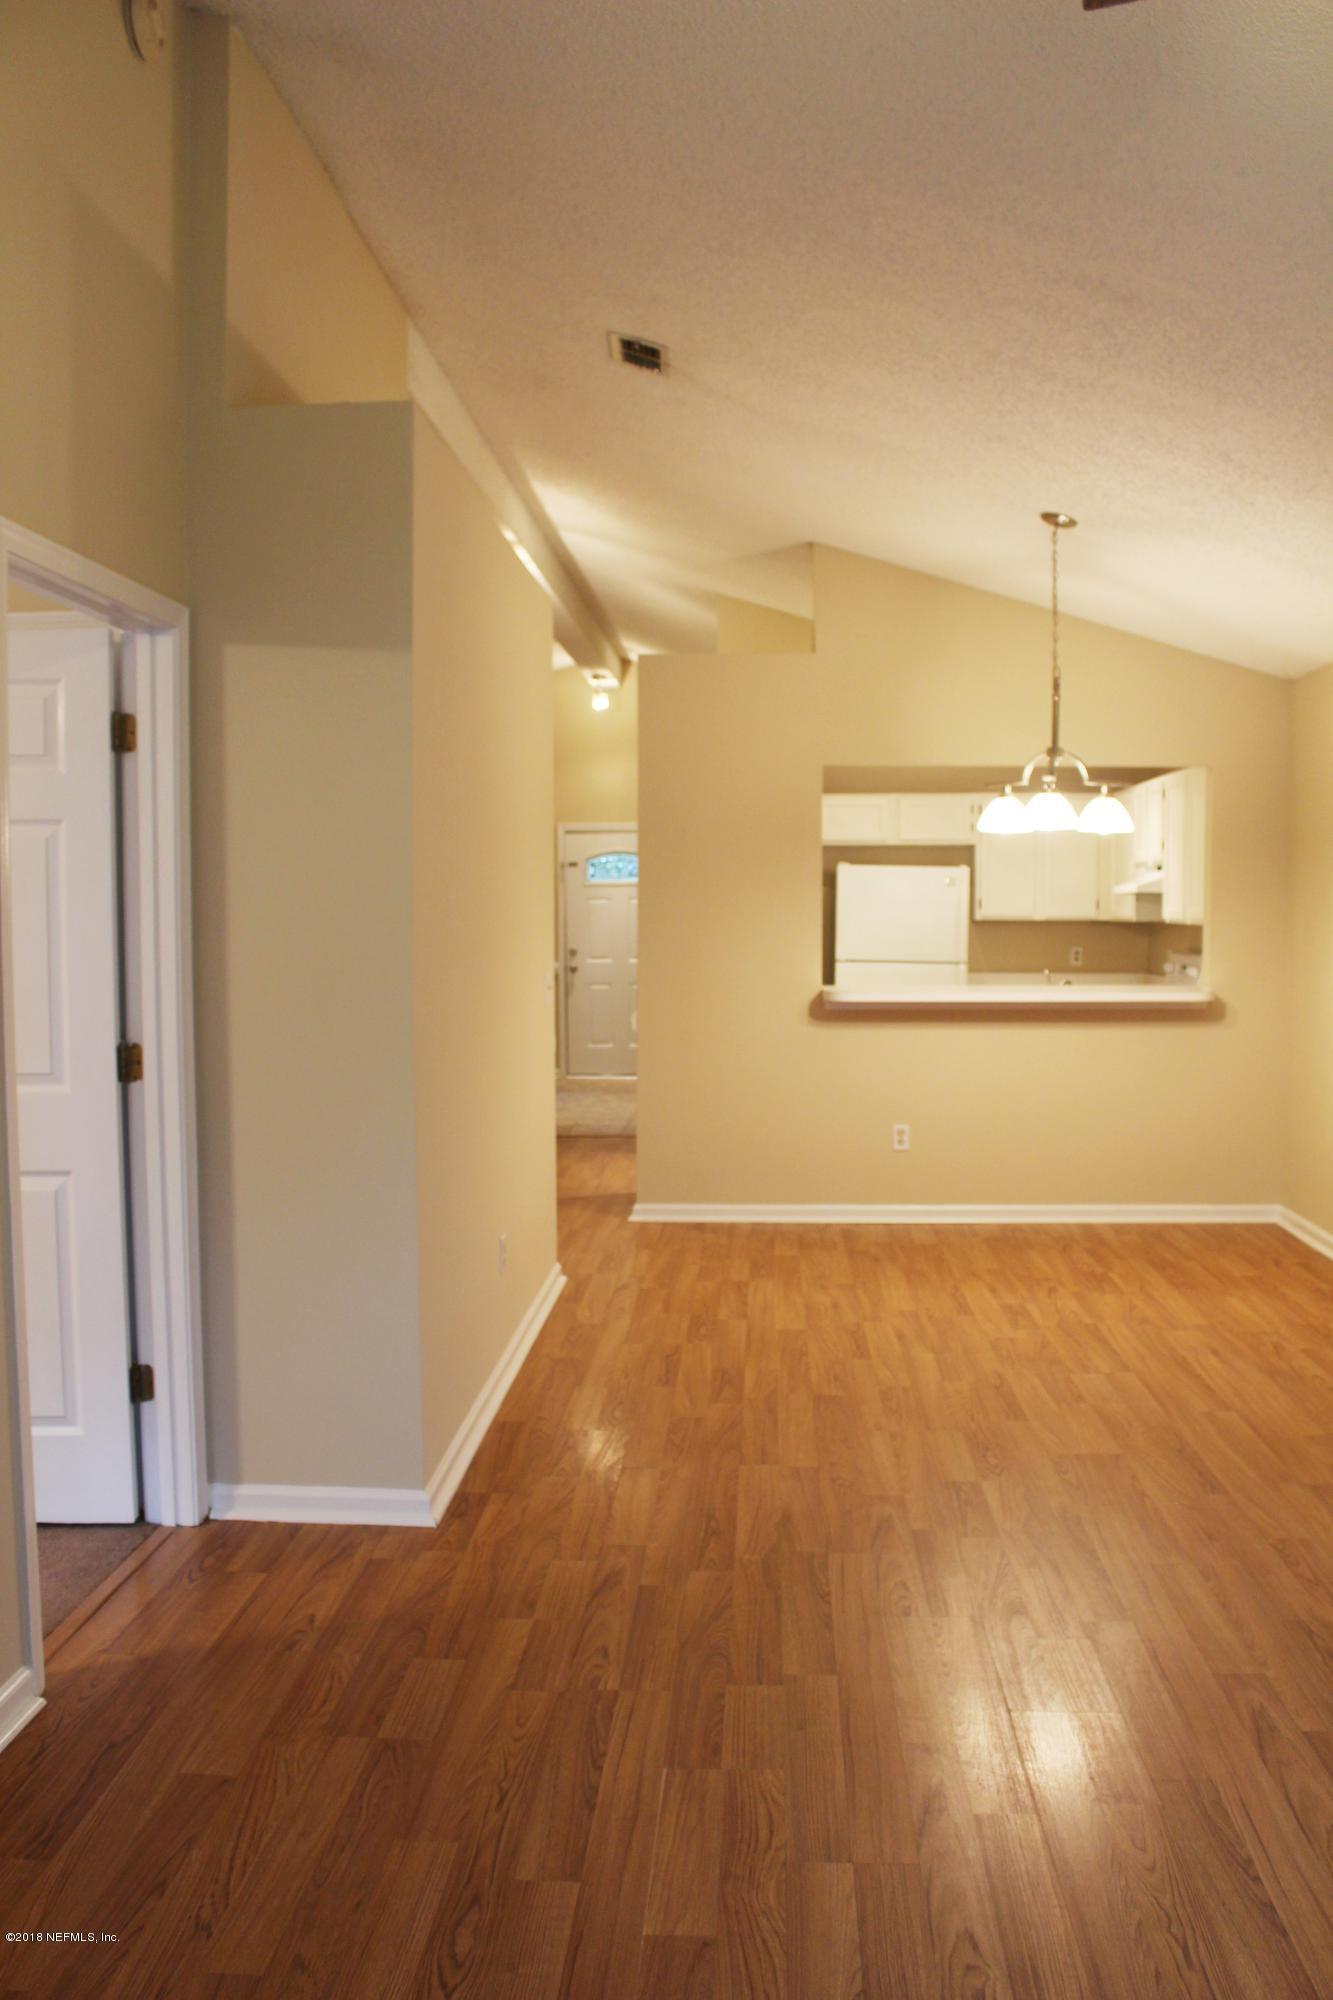 8397 ARGYLE CORNERS, JACKSONVILLE, FLORIDA 32244, 3 Bedrooms Bedrooms, ,2 BathroomsBathrooms,Residential - single family,For sale,ARGYLE CORNERS,948854